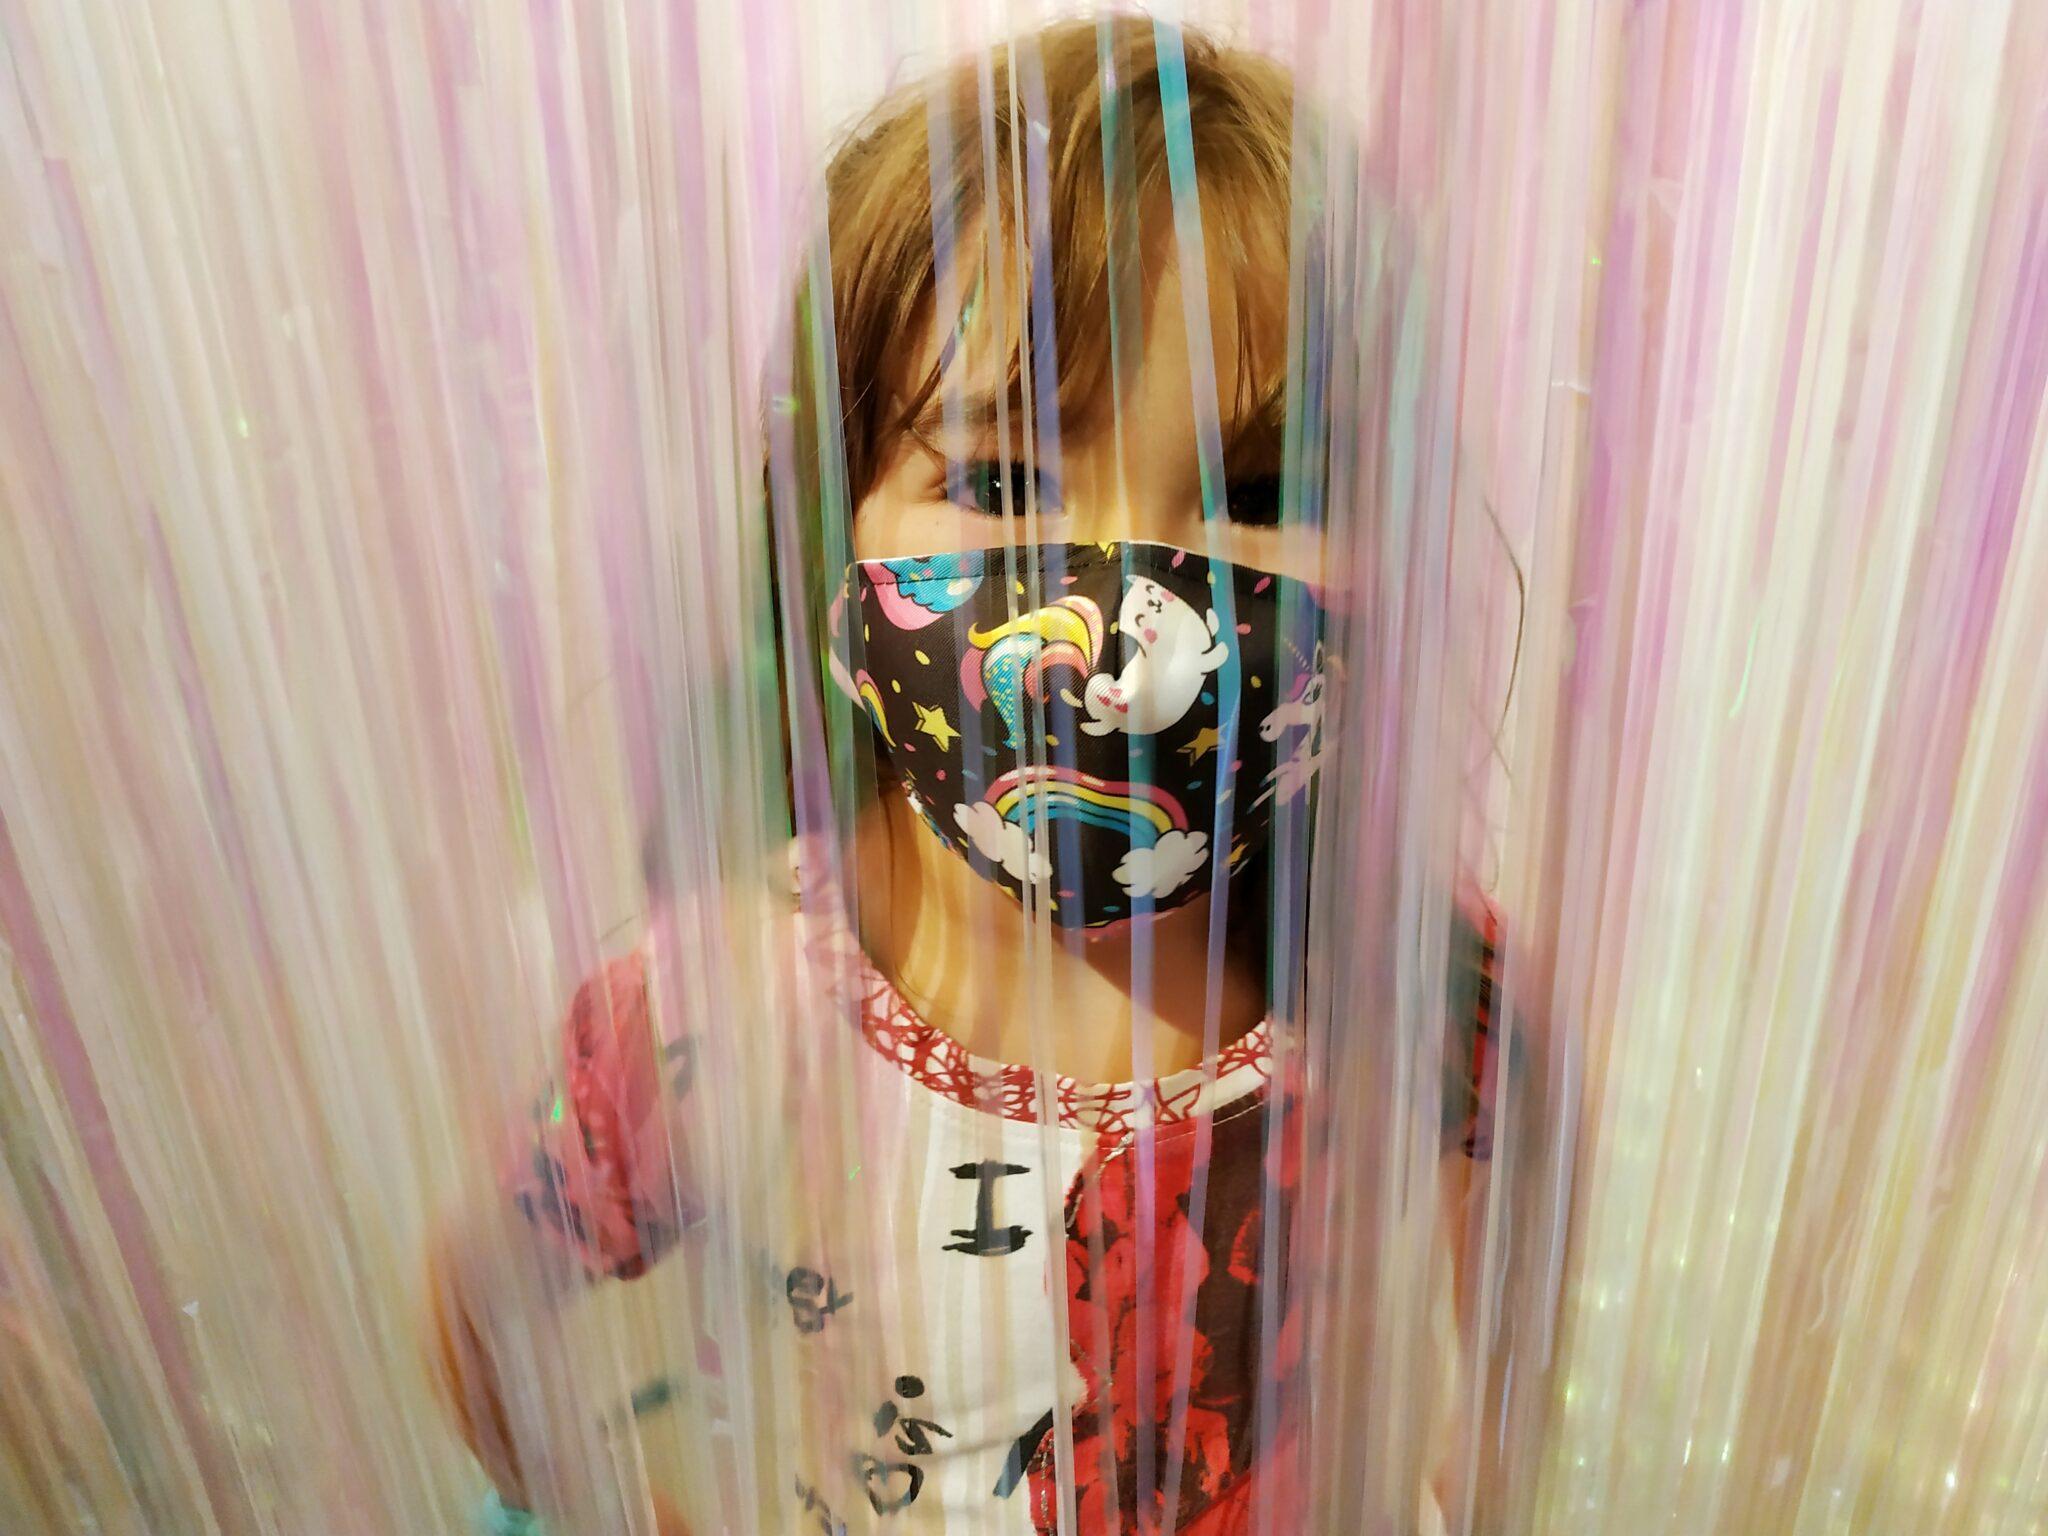 IMG 20200926 171043 01 scaled - Visitar IKONO Madrid con niños